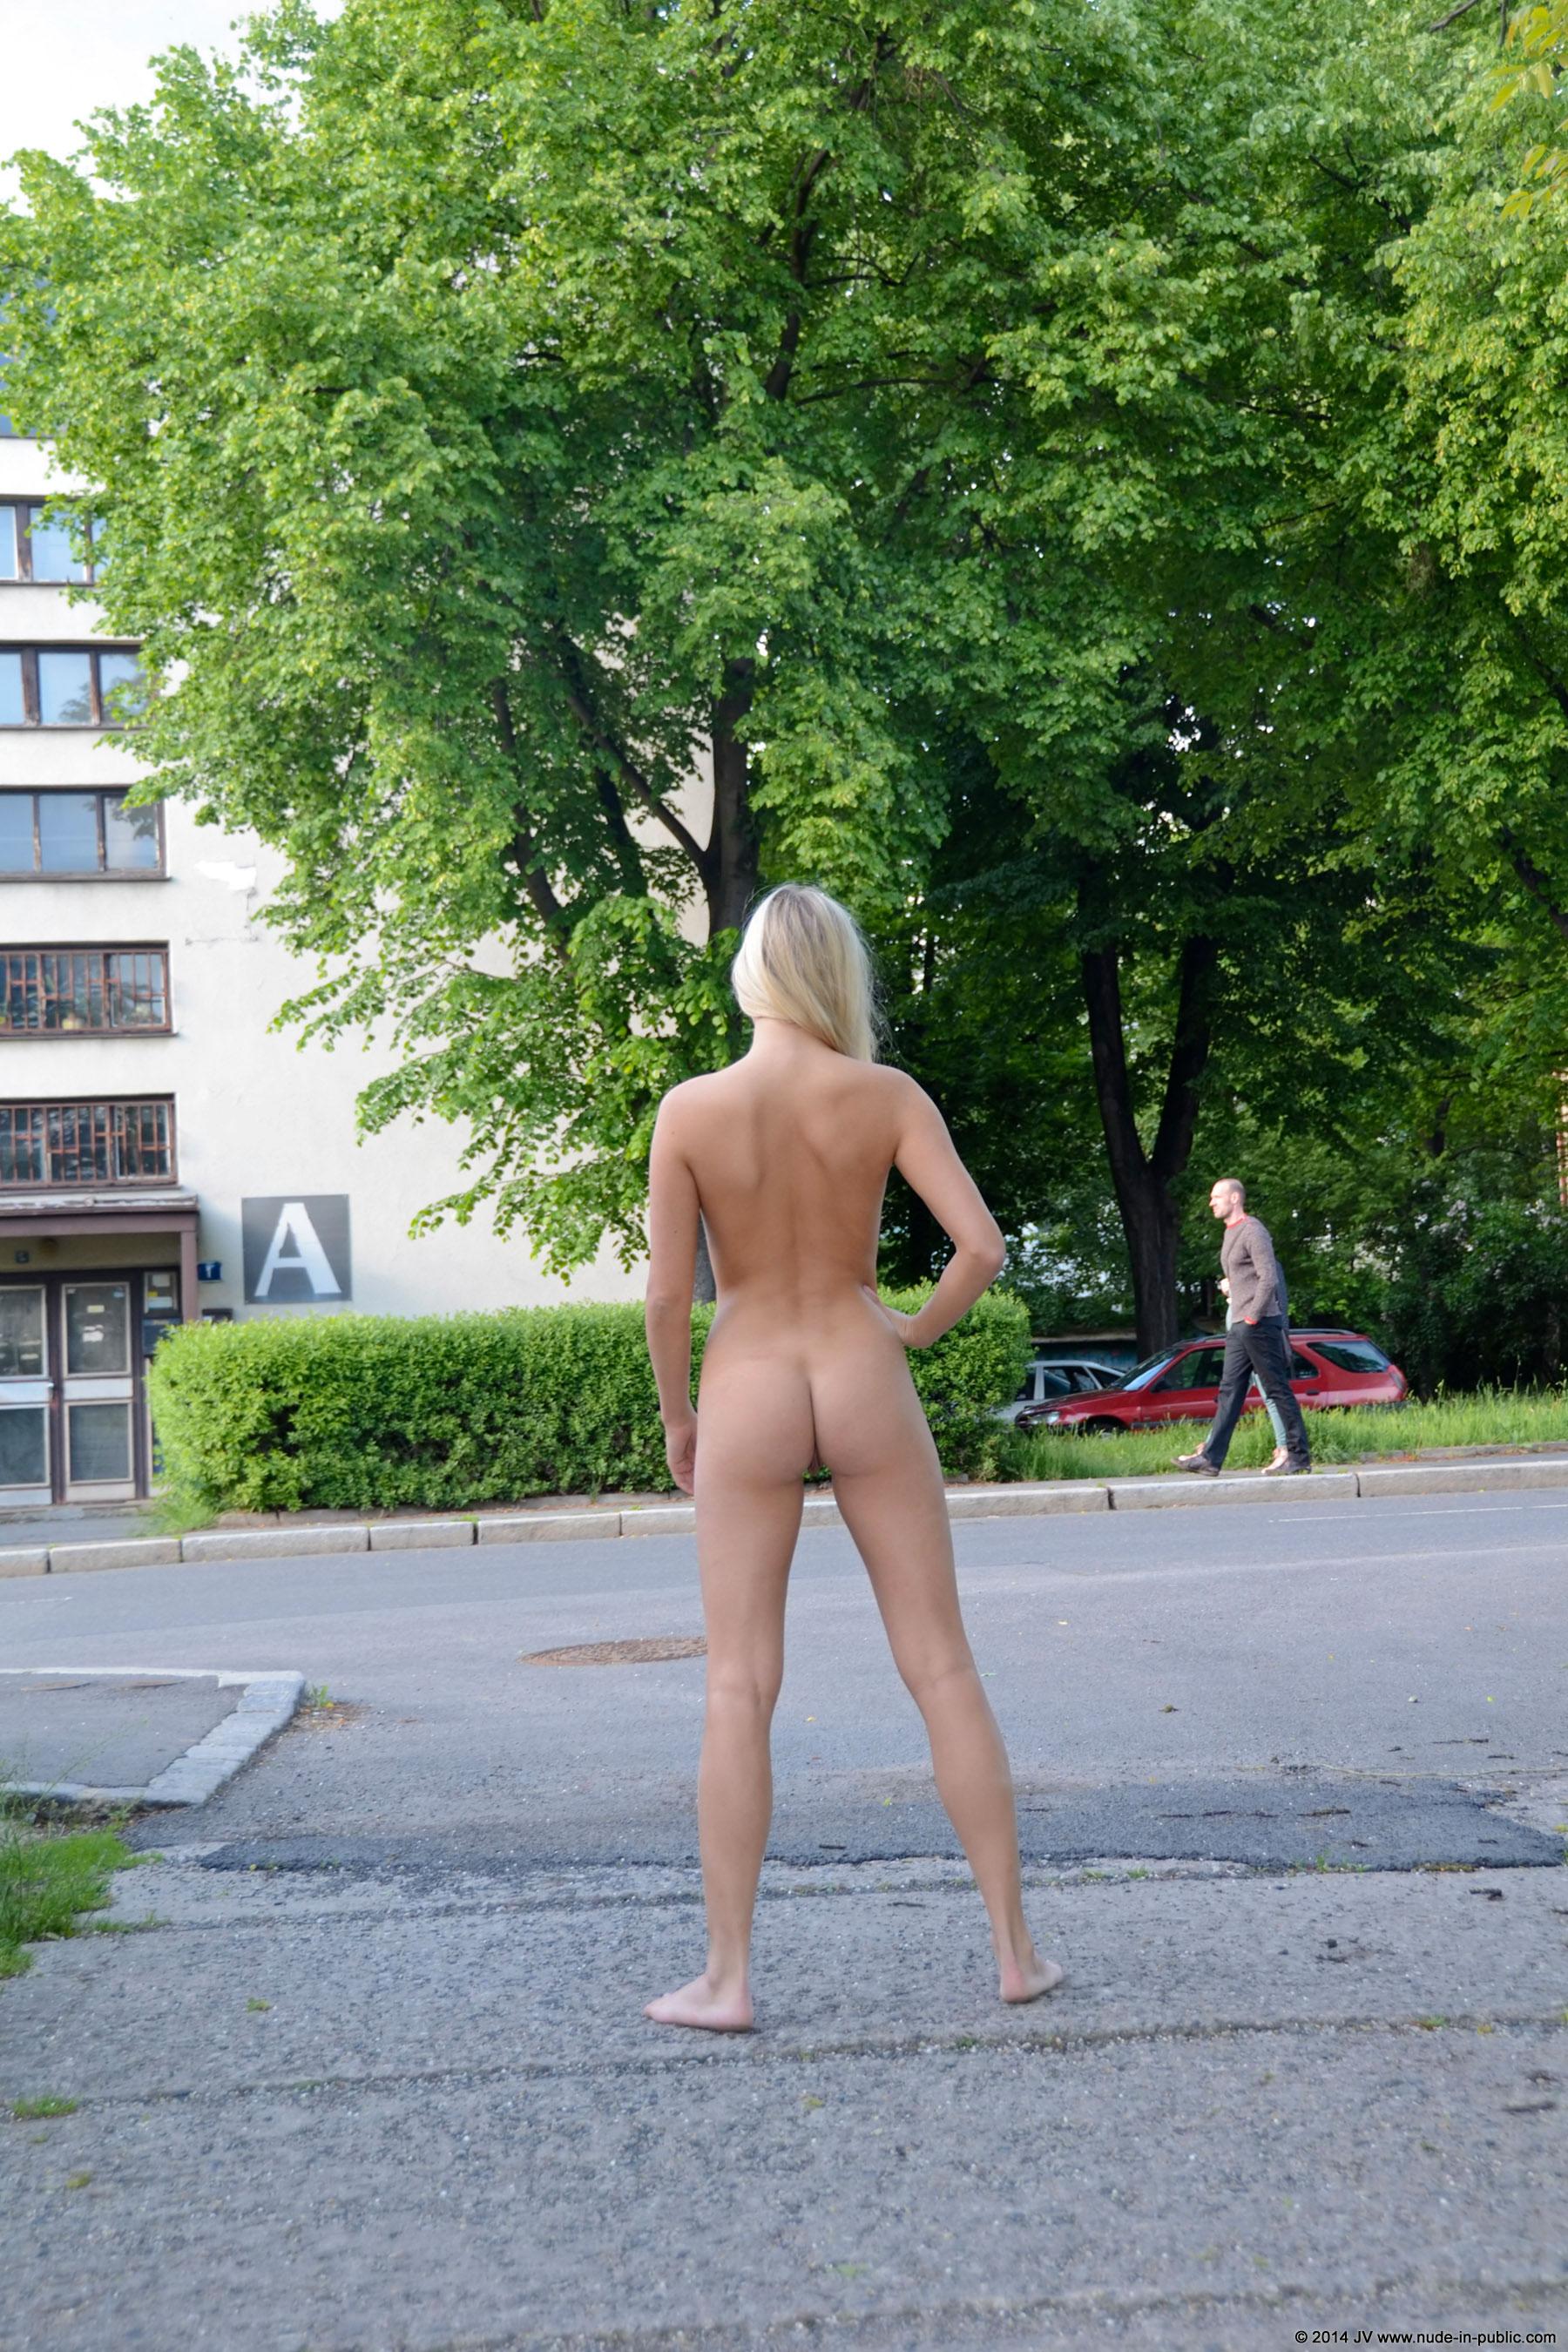 karolina-m-blonde-on-the-street-nude-in-public-25